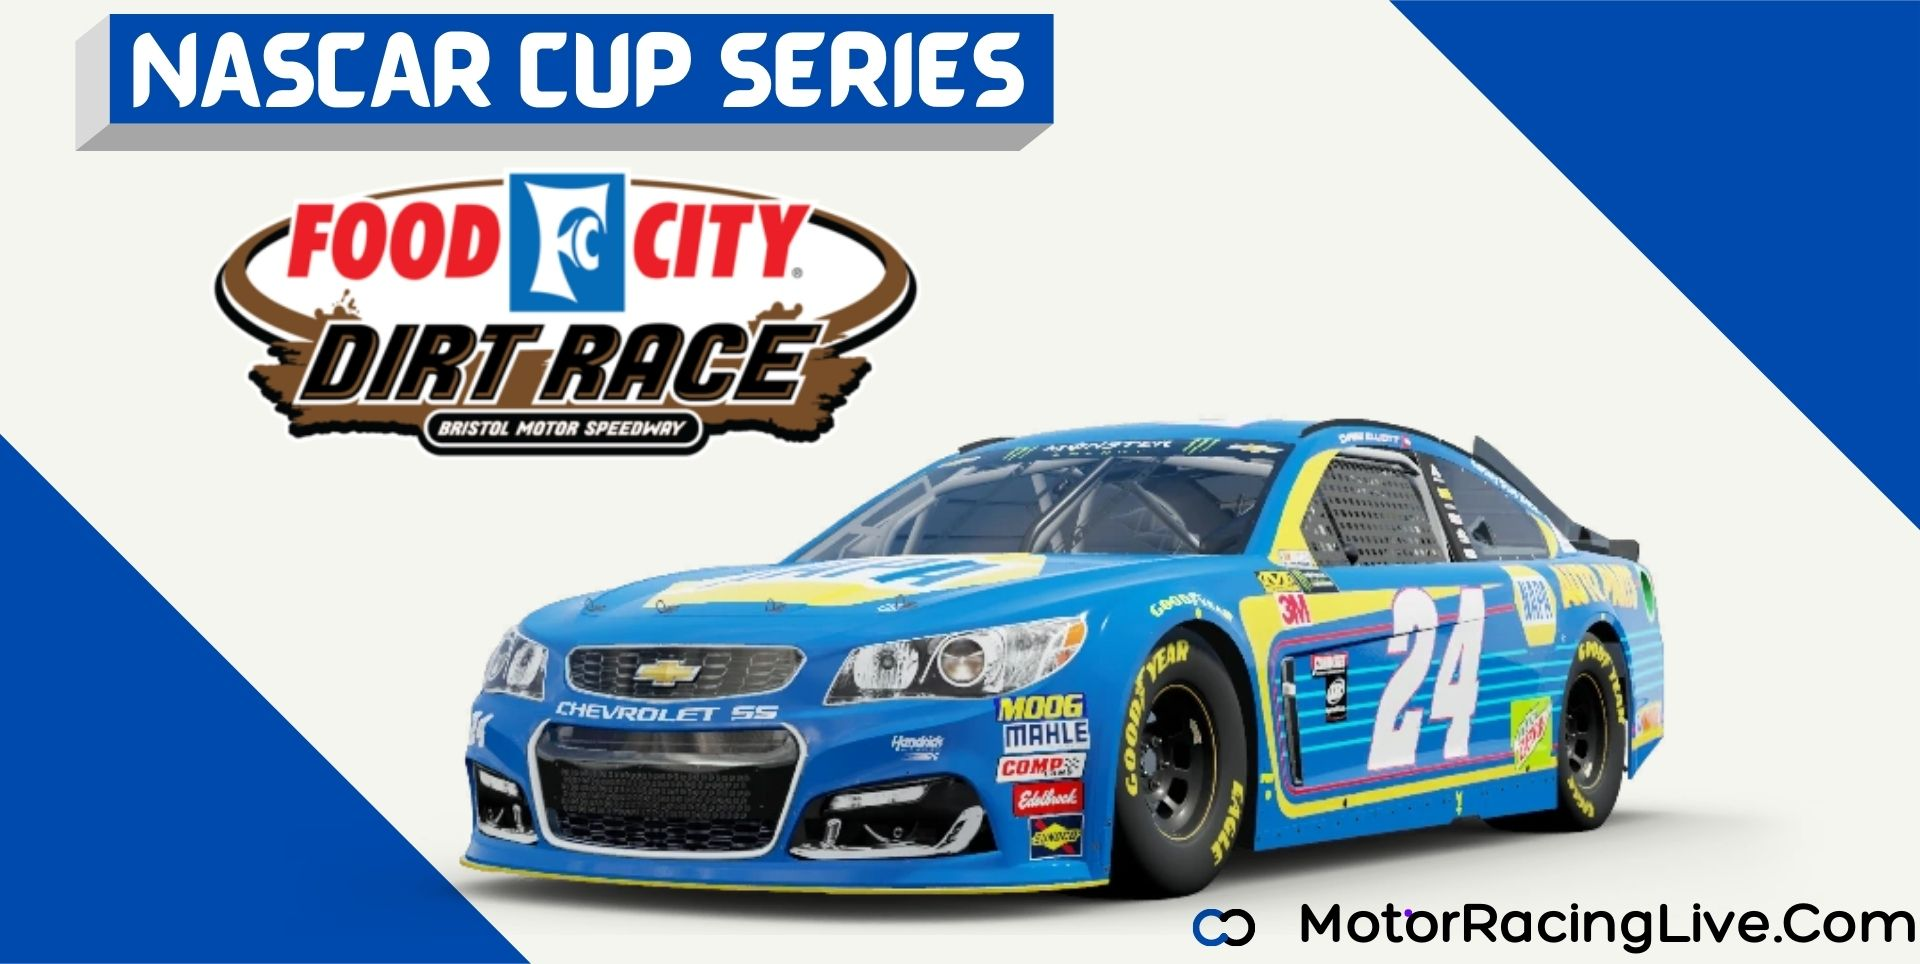 Food City Dirt Race Nascar Cup 2021 Live Stream